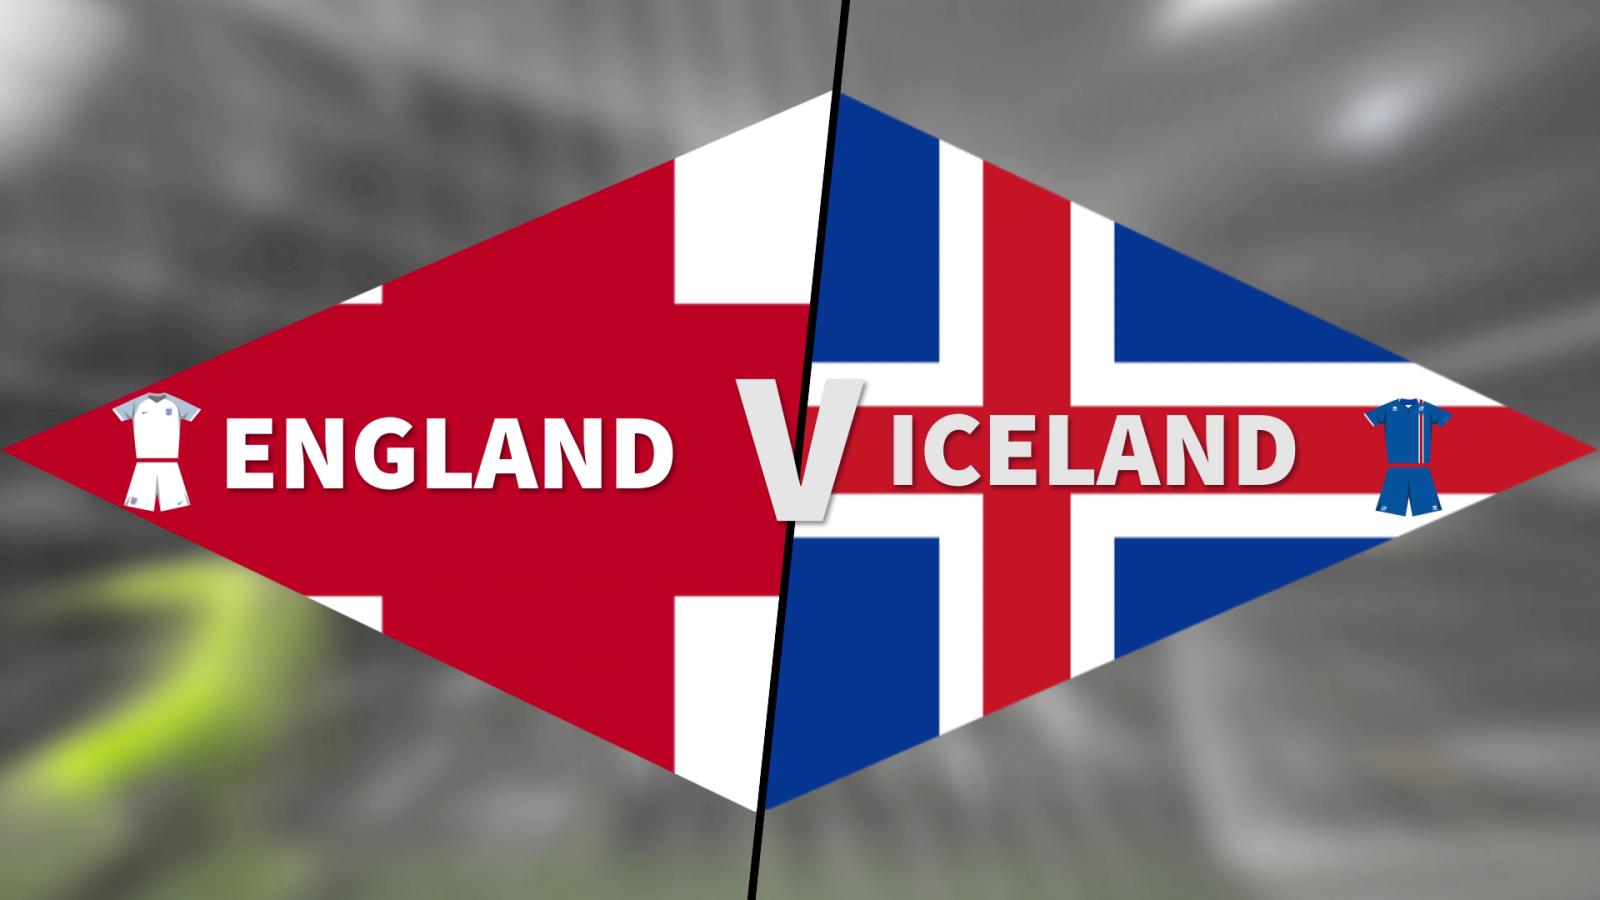 france vs iceland - photo #24